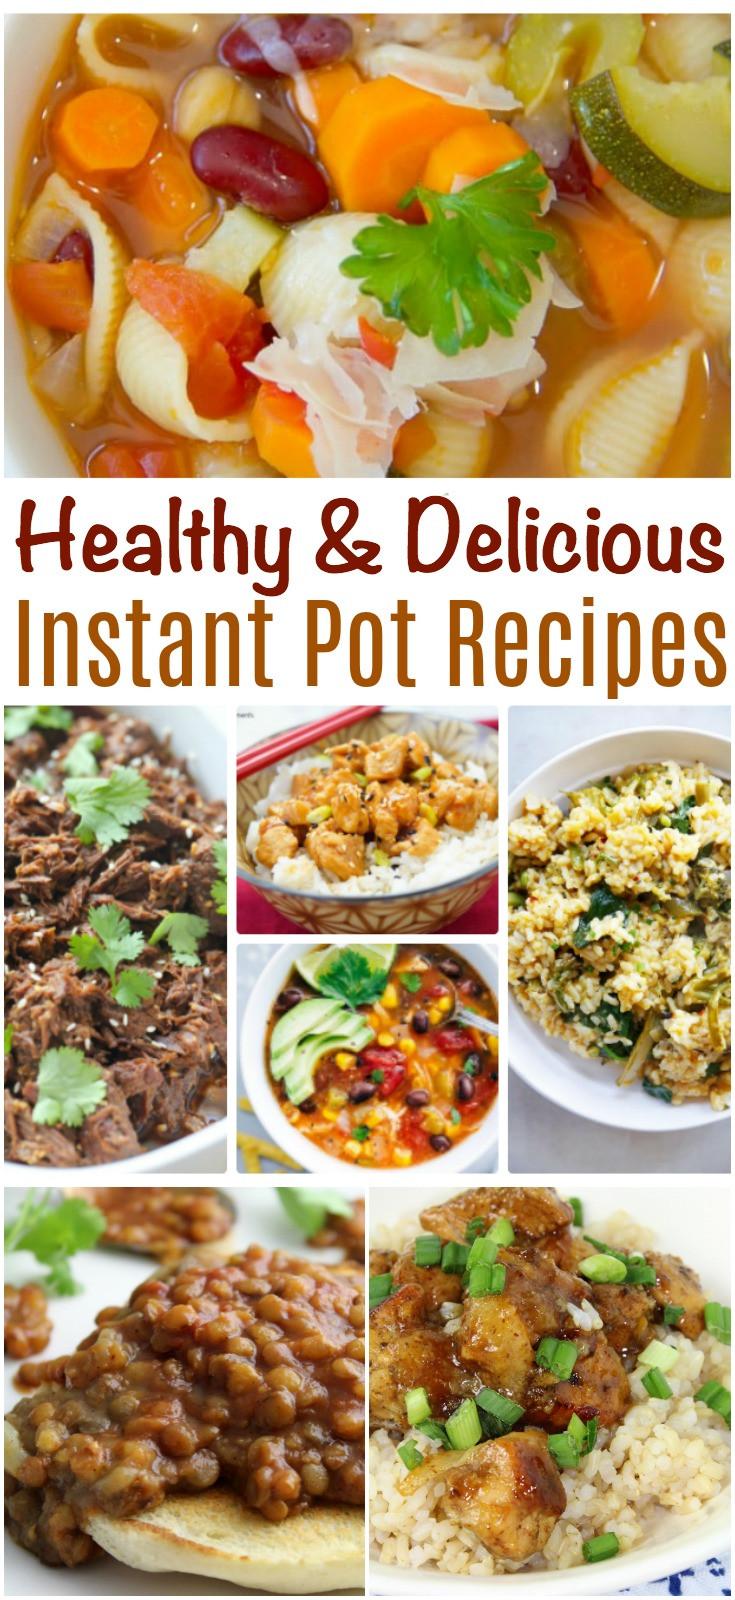 Best Healthy Instant Pot Recipes  Healthy and Delicious Instant Pot Recipes